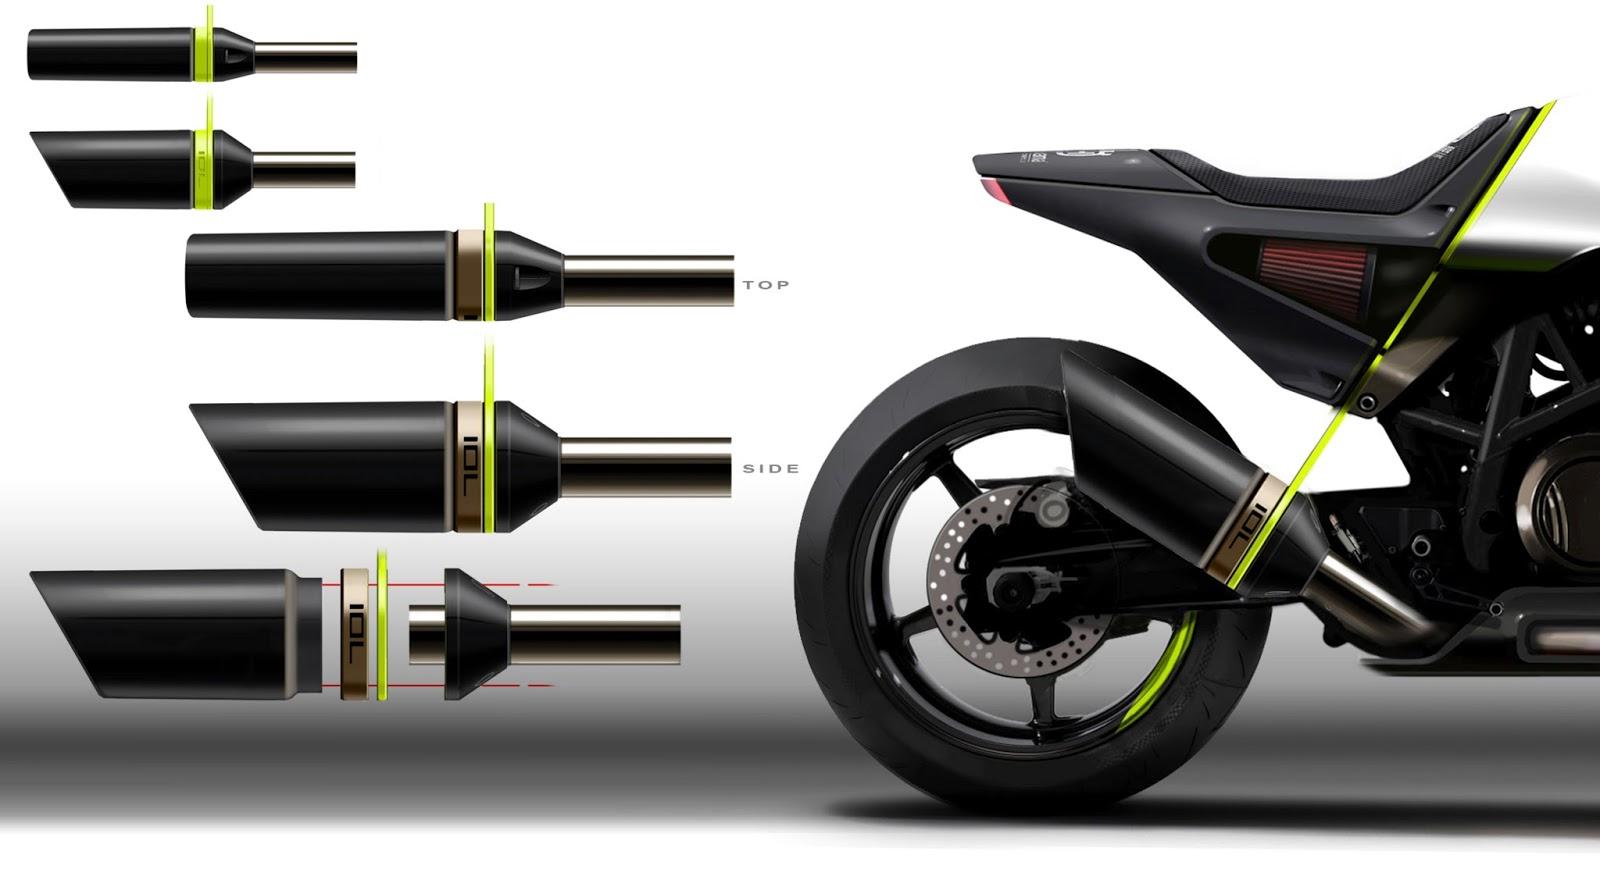 Racing Caf 232 Husqvarna Vitpilen 701 Concept Eicma 2015